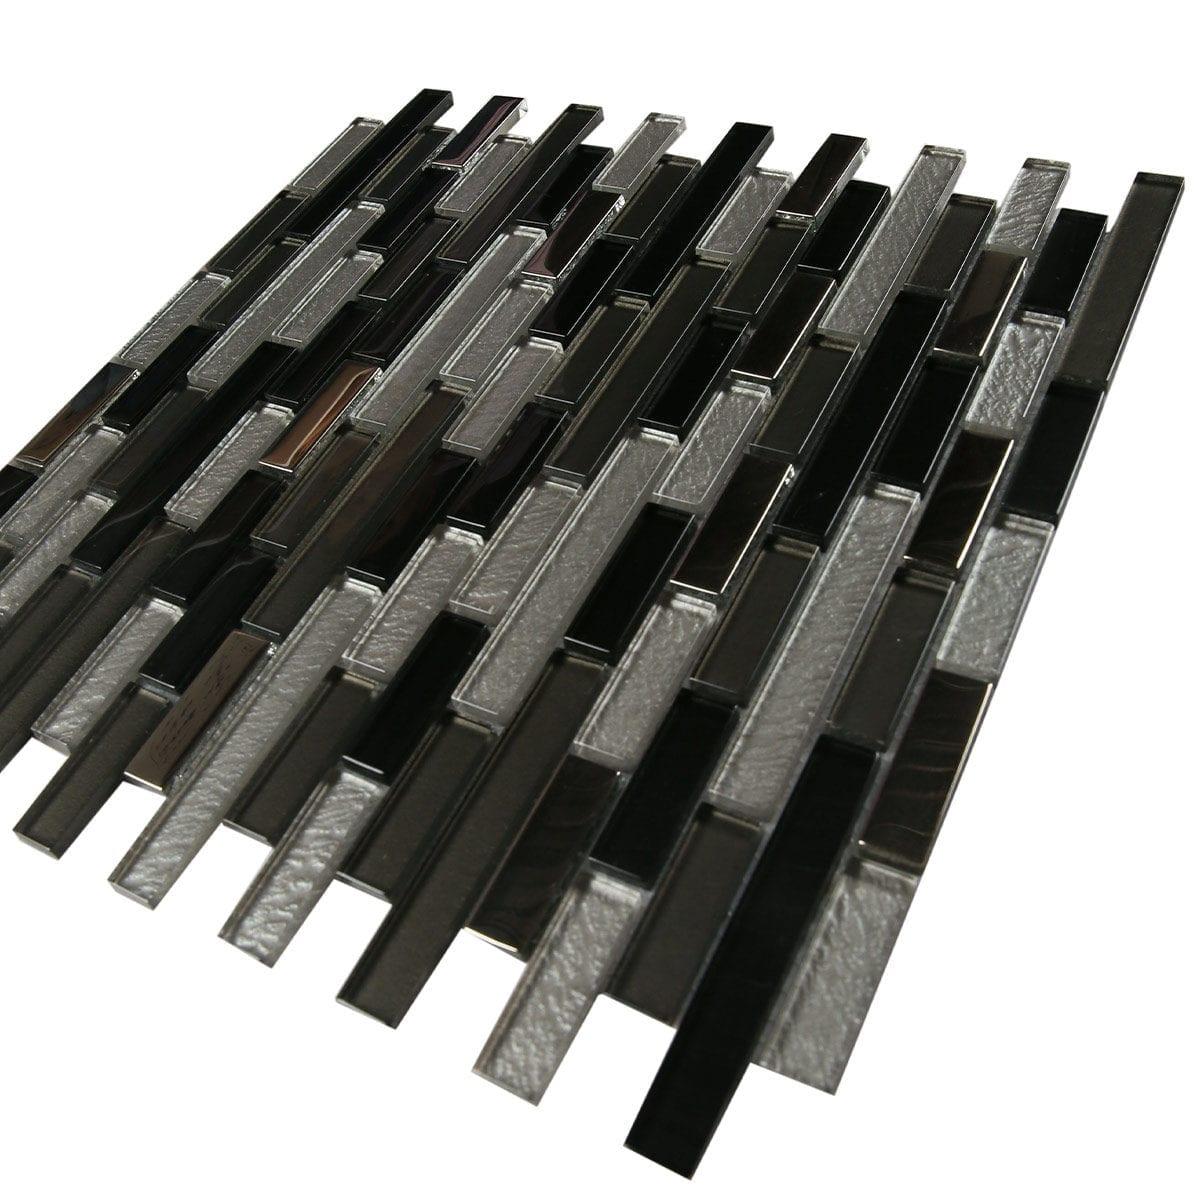 M4T031 2 Brick pattern White grey black metalic finish